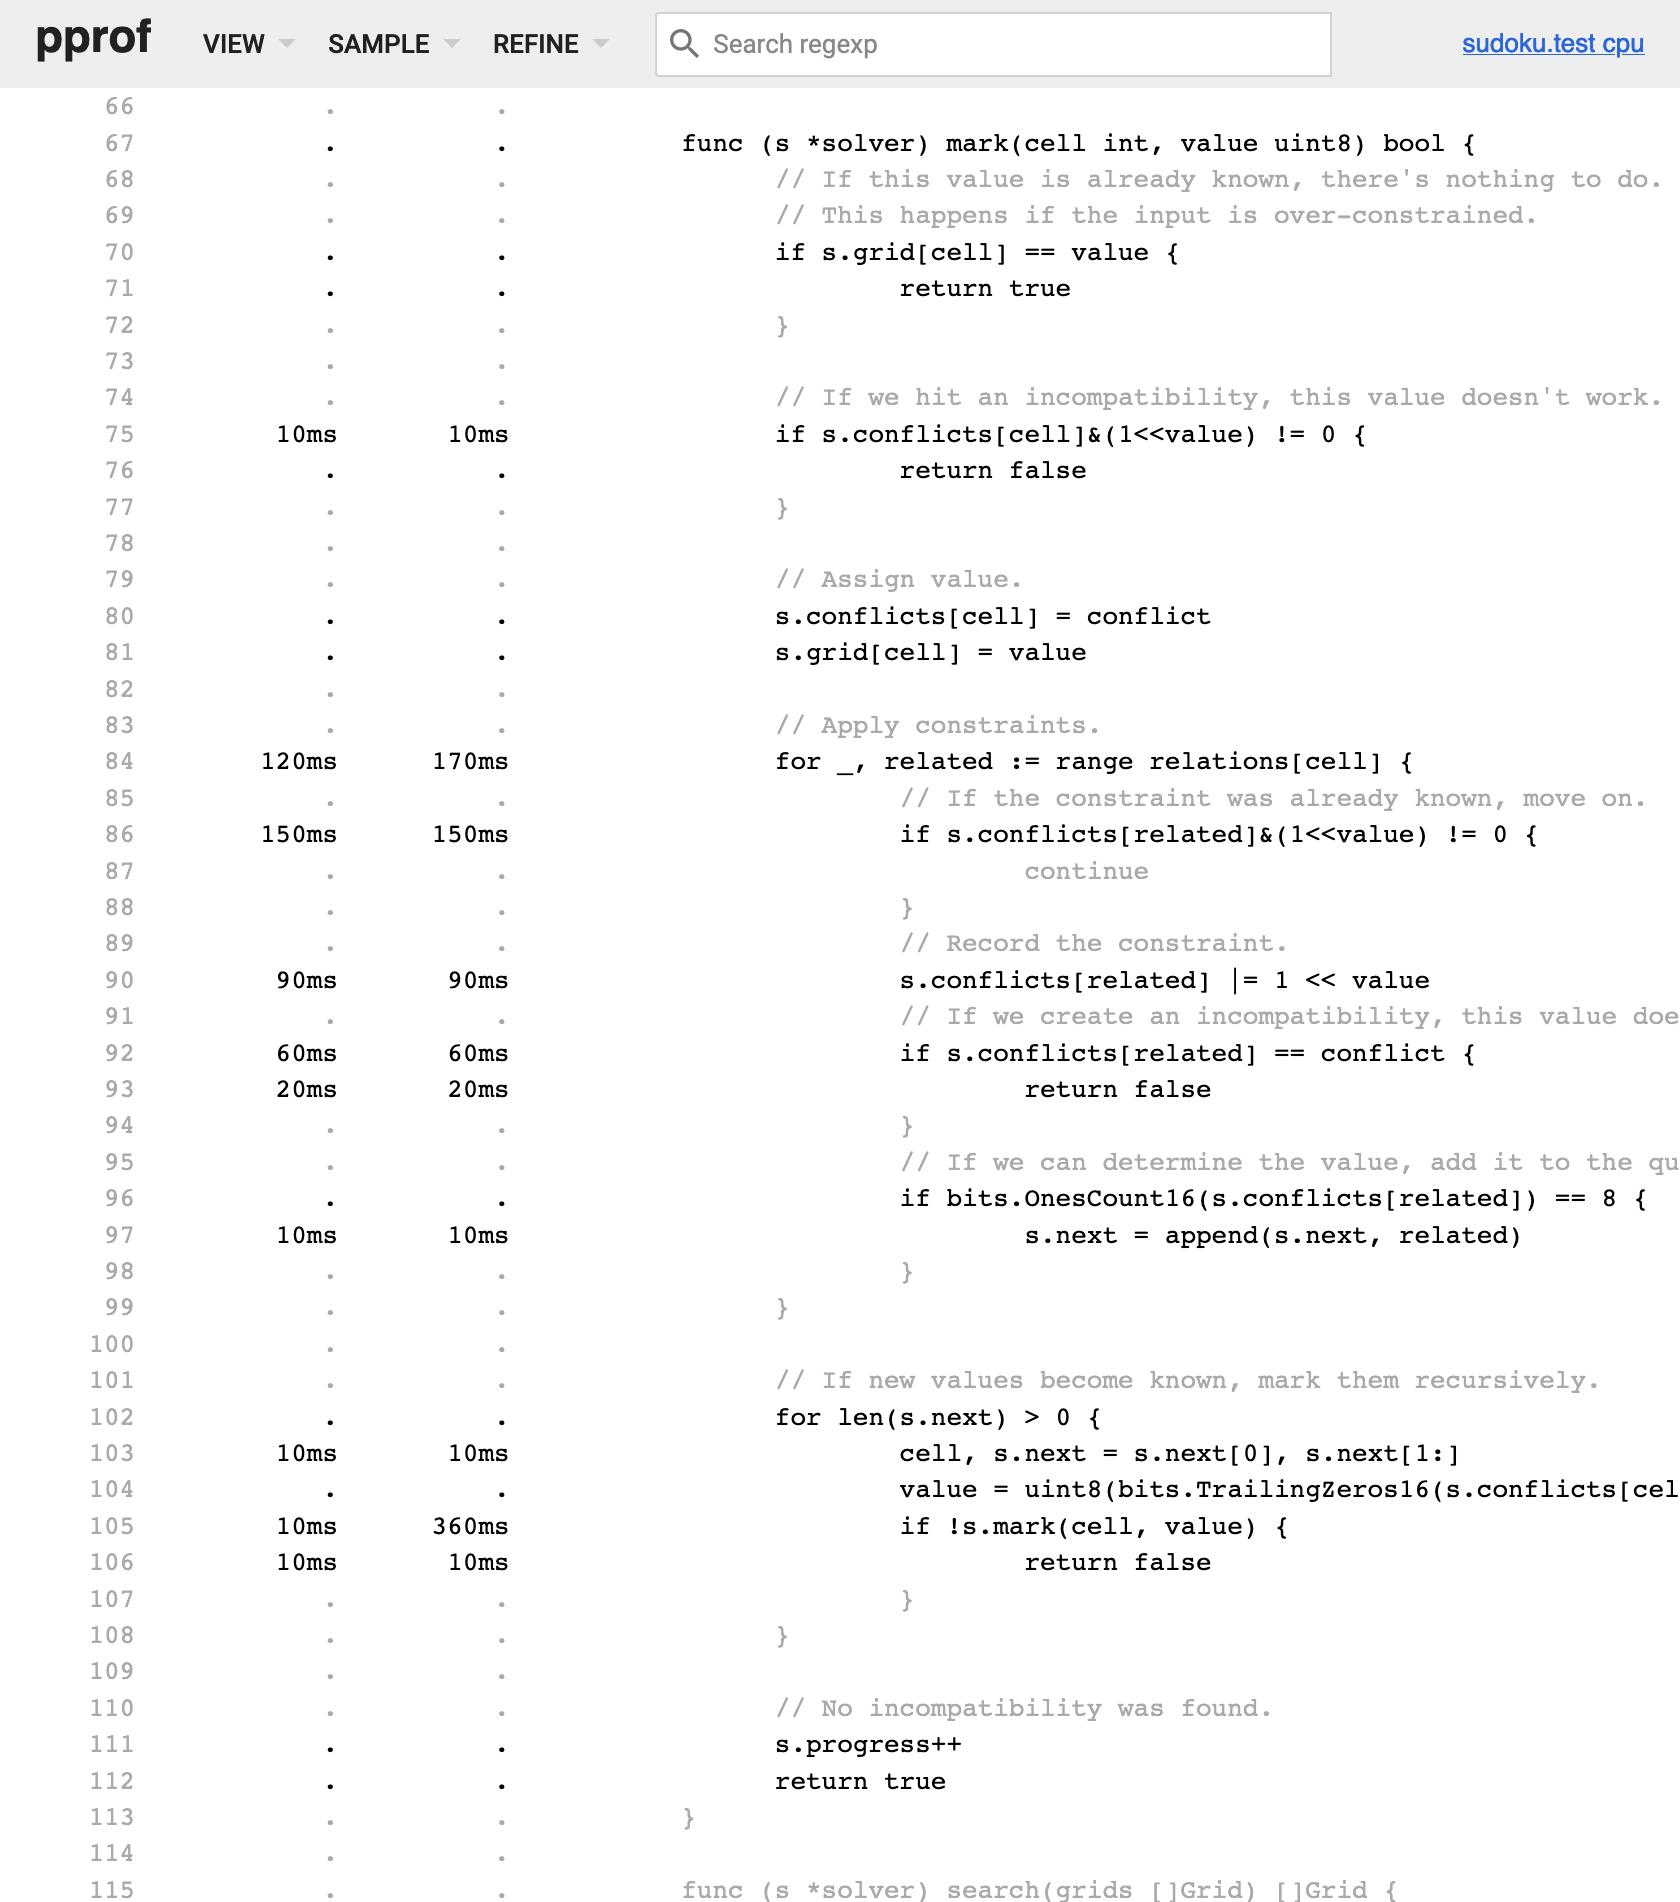 5 - CPU profile of mark